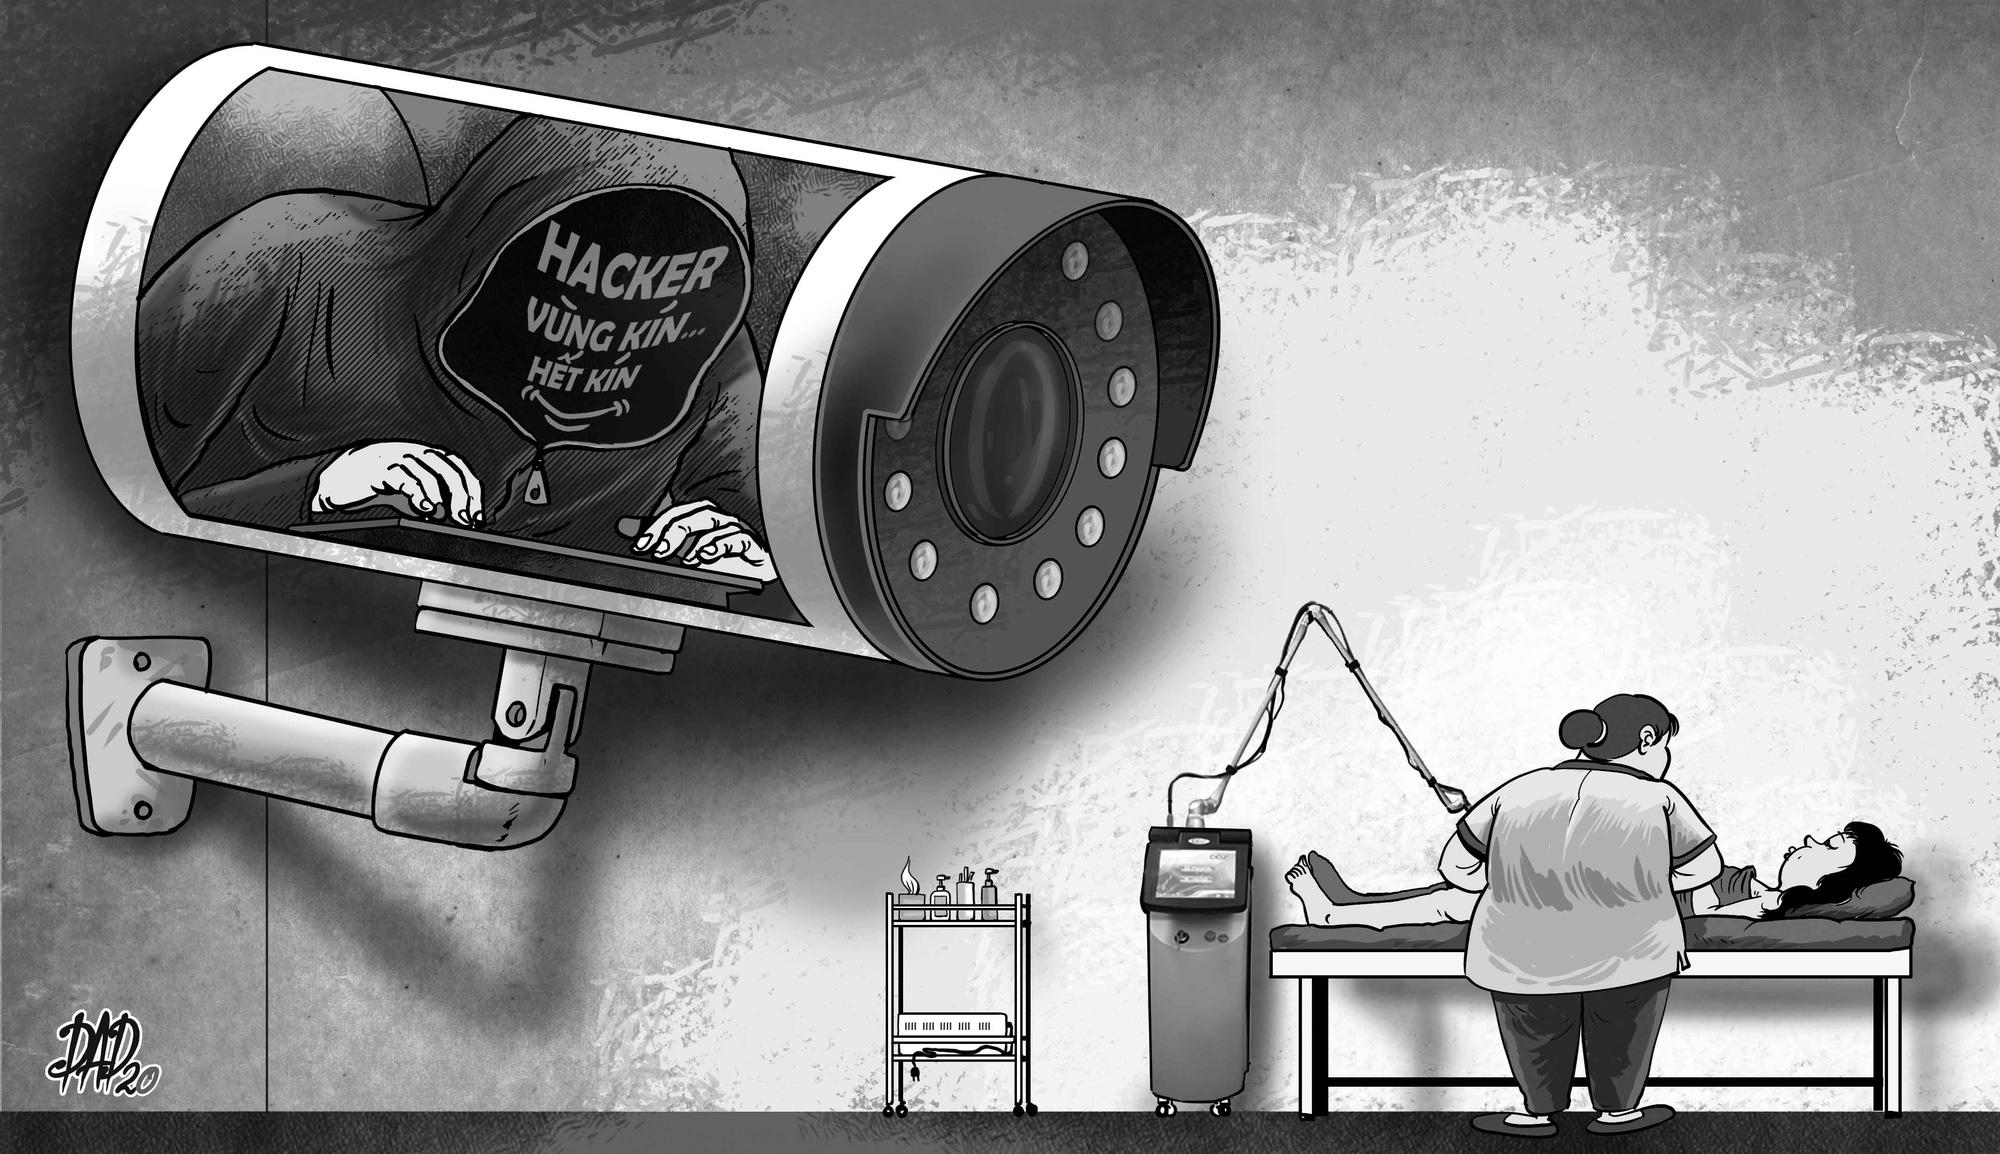 Sensitive CCTV footage of customers at Hanoi spas sold online